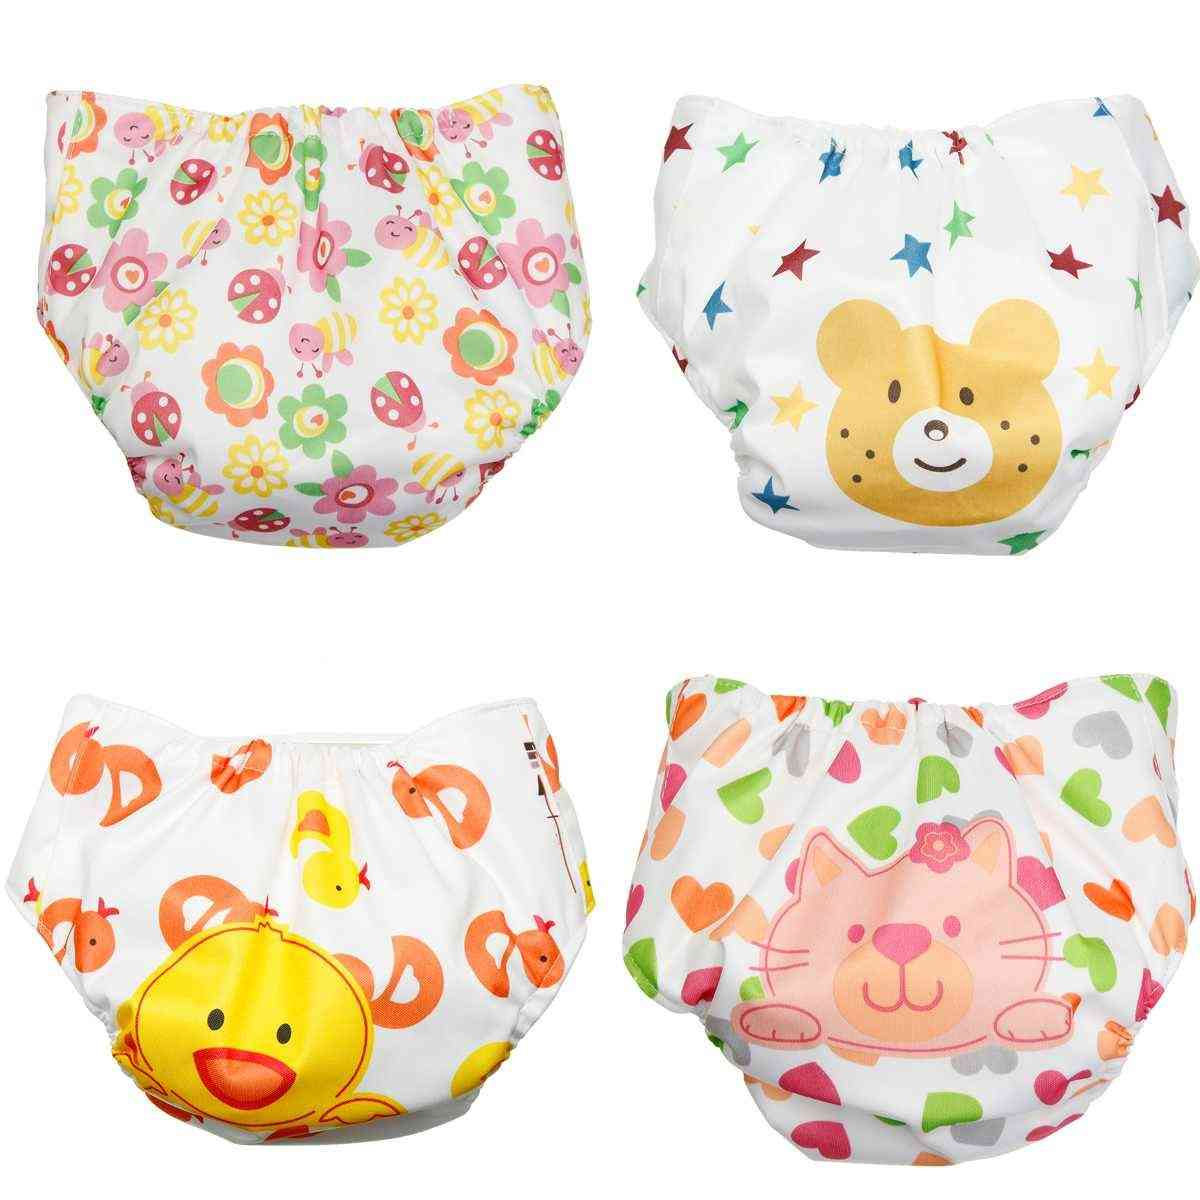 Reusable Washable Baby Printed Nappy Pocket Cloth Diaper